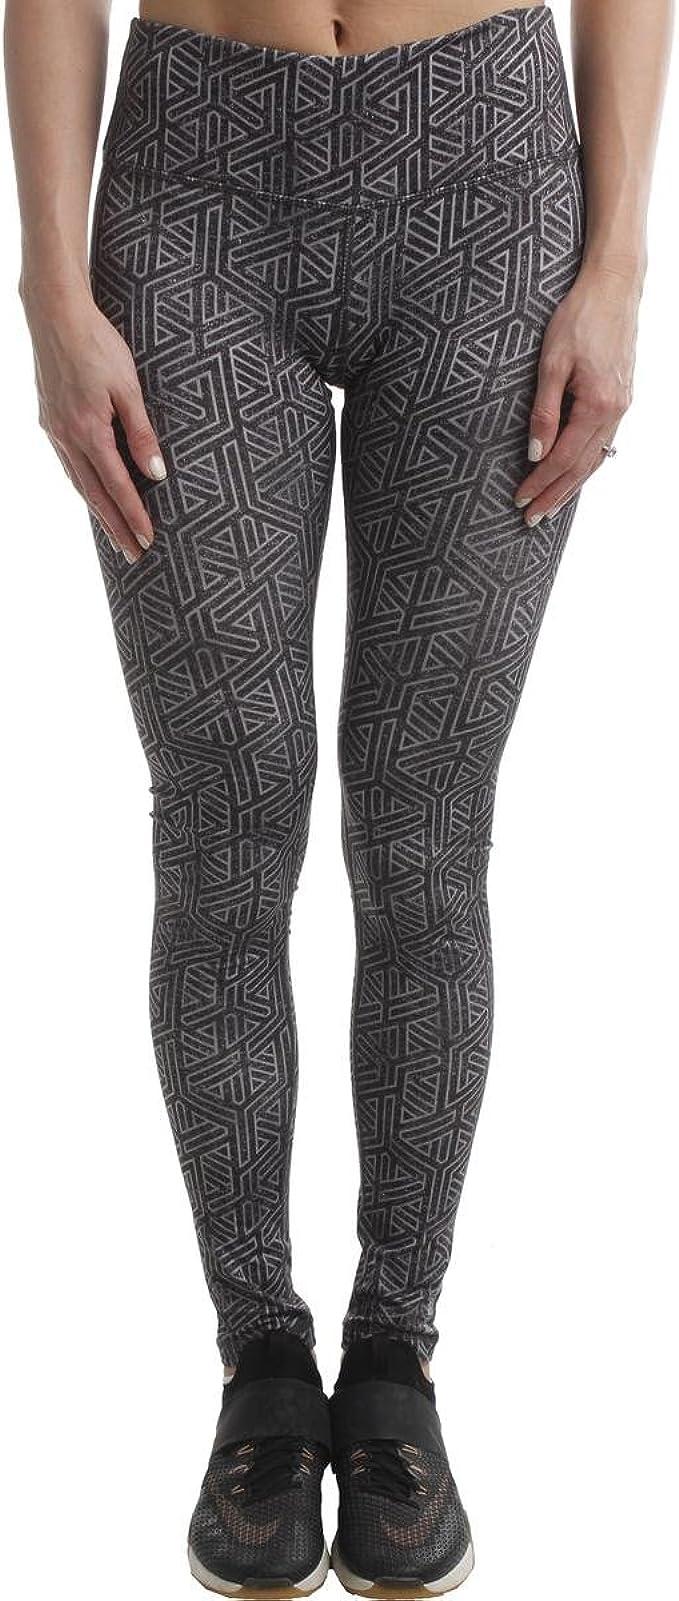 Reebok Womens Modular Yoga Fitness Athletic Leggings at ...